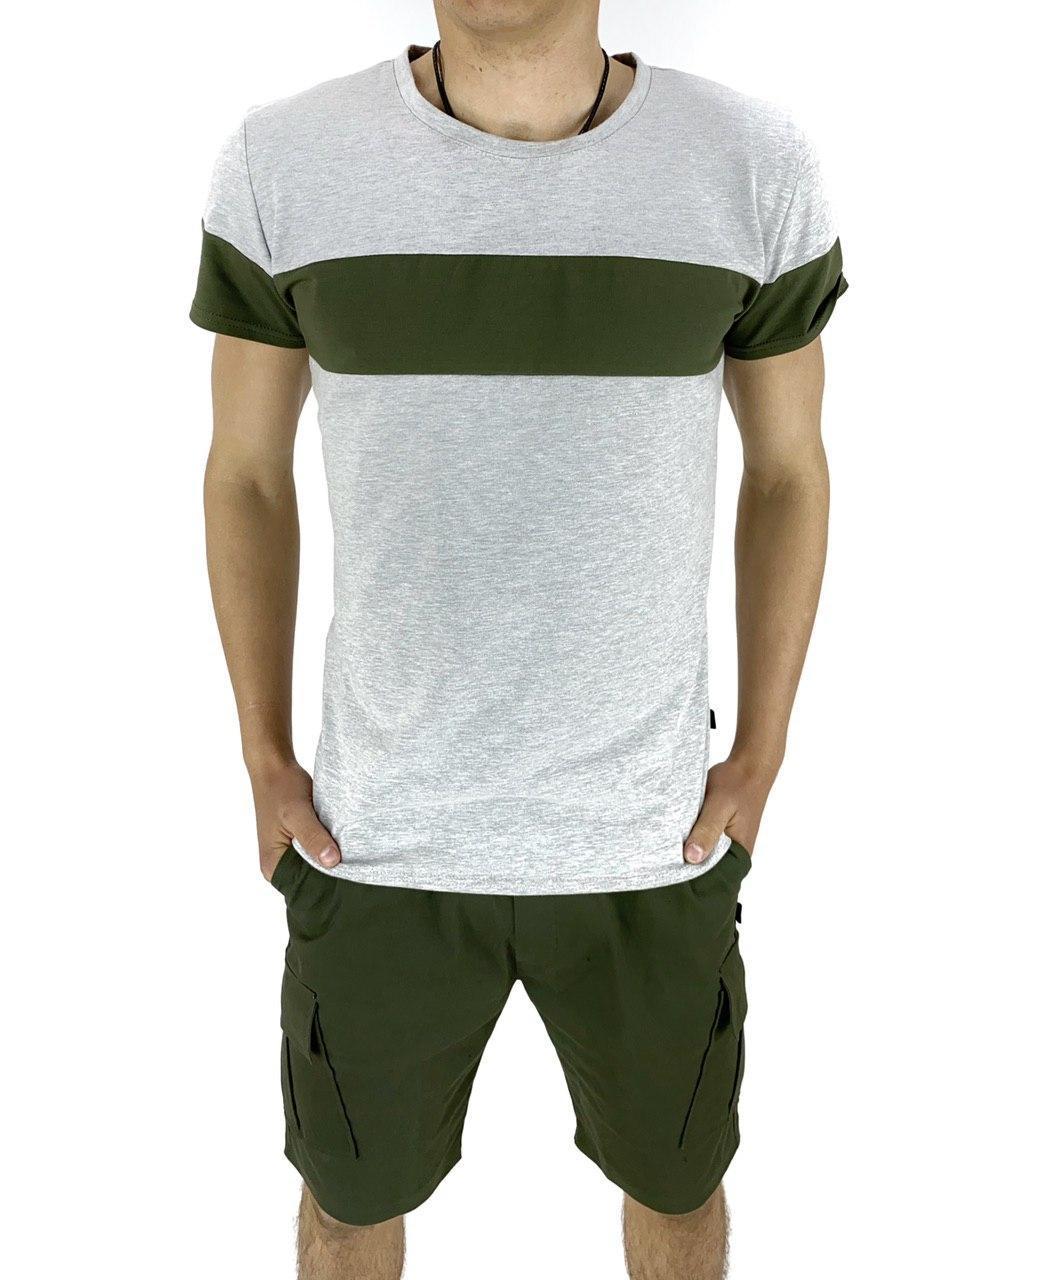 Комплект Футболка Intruder Color Stripe шорты Miami XL Хаки с серым (Kom 15893762/ 5)